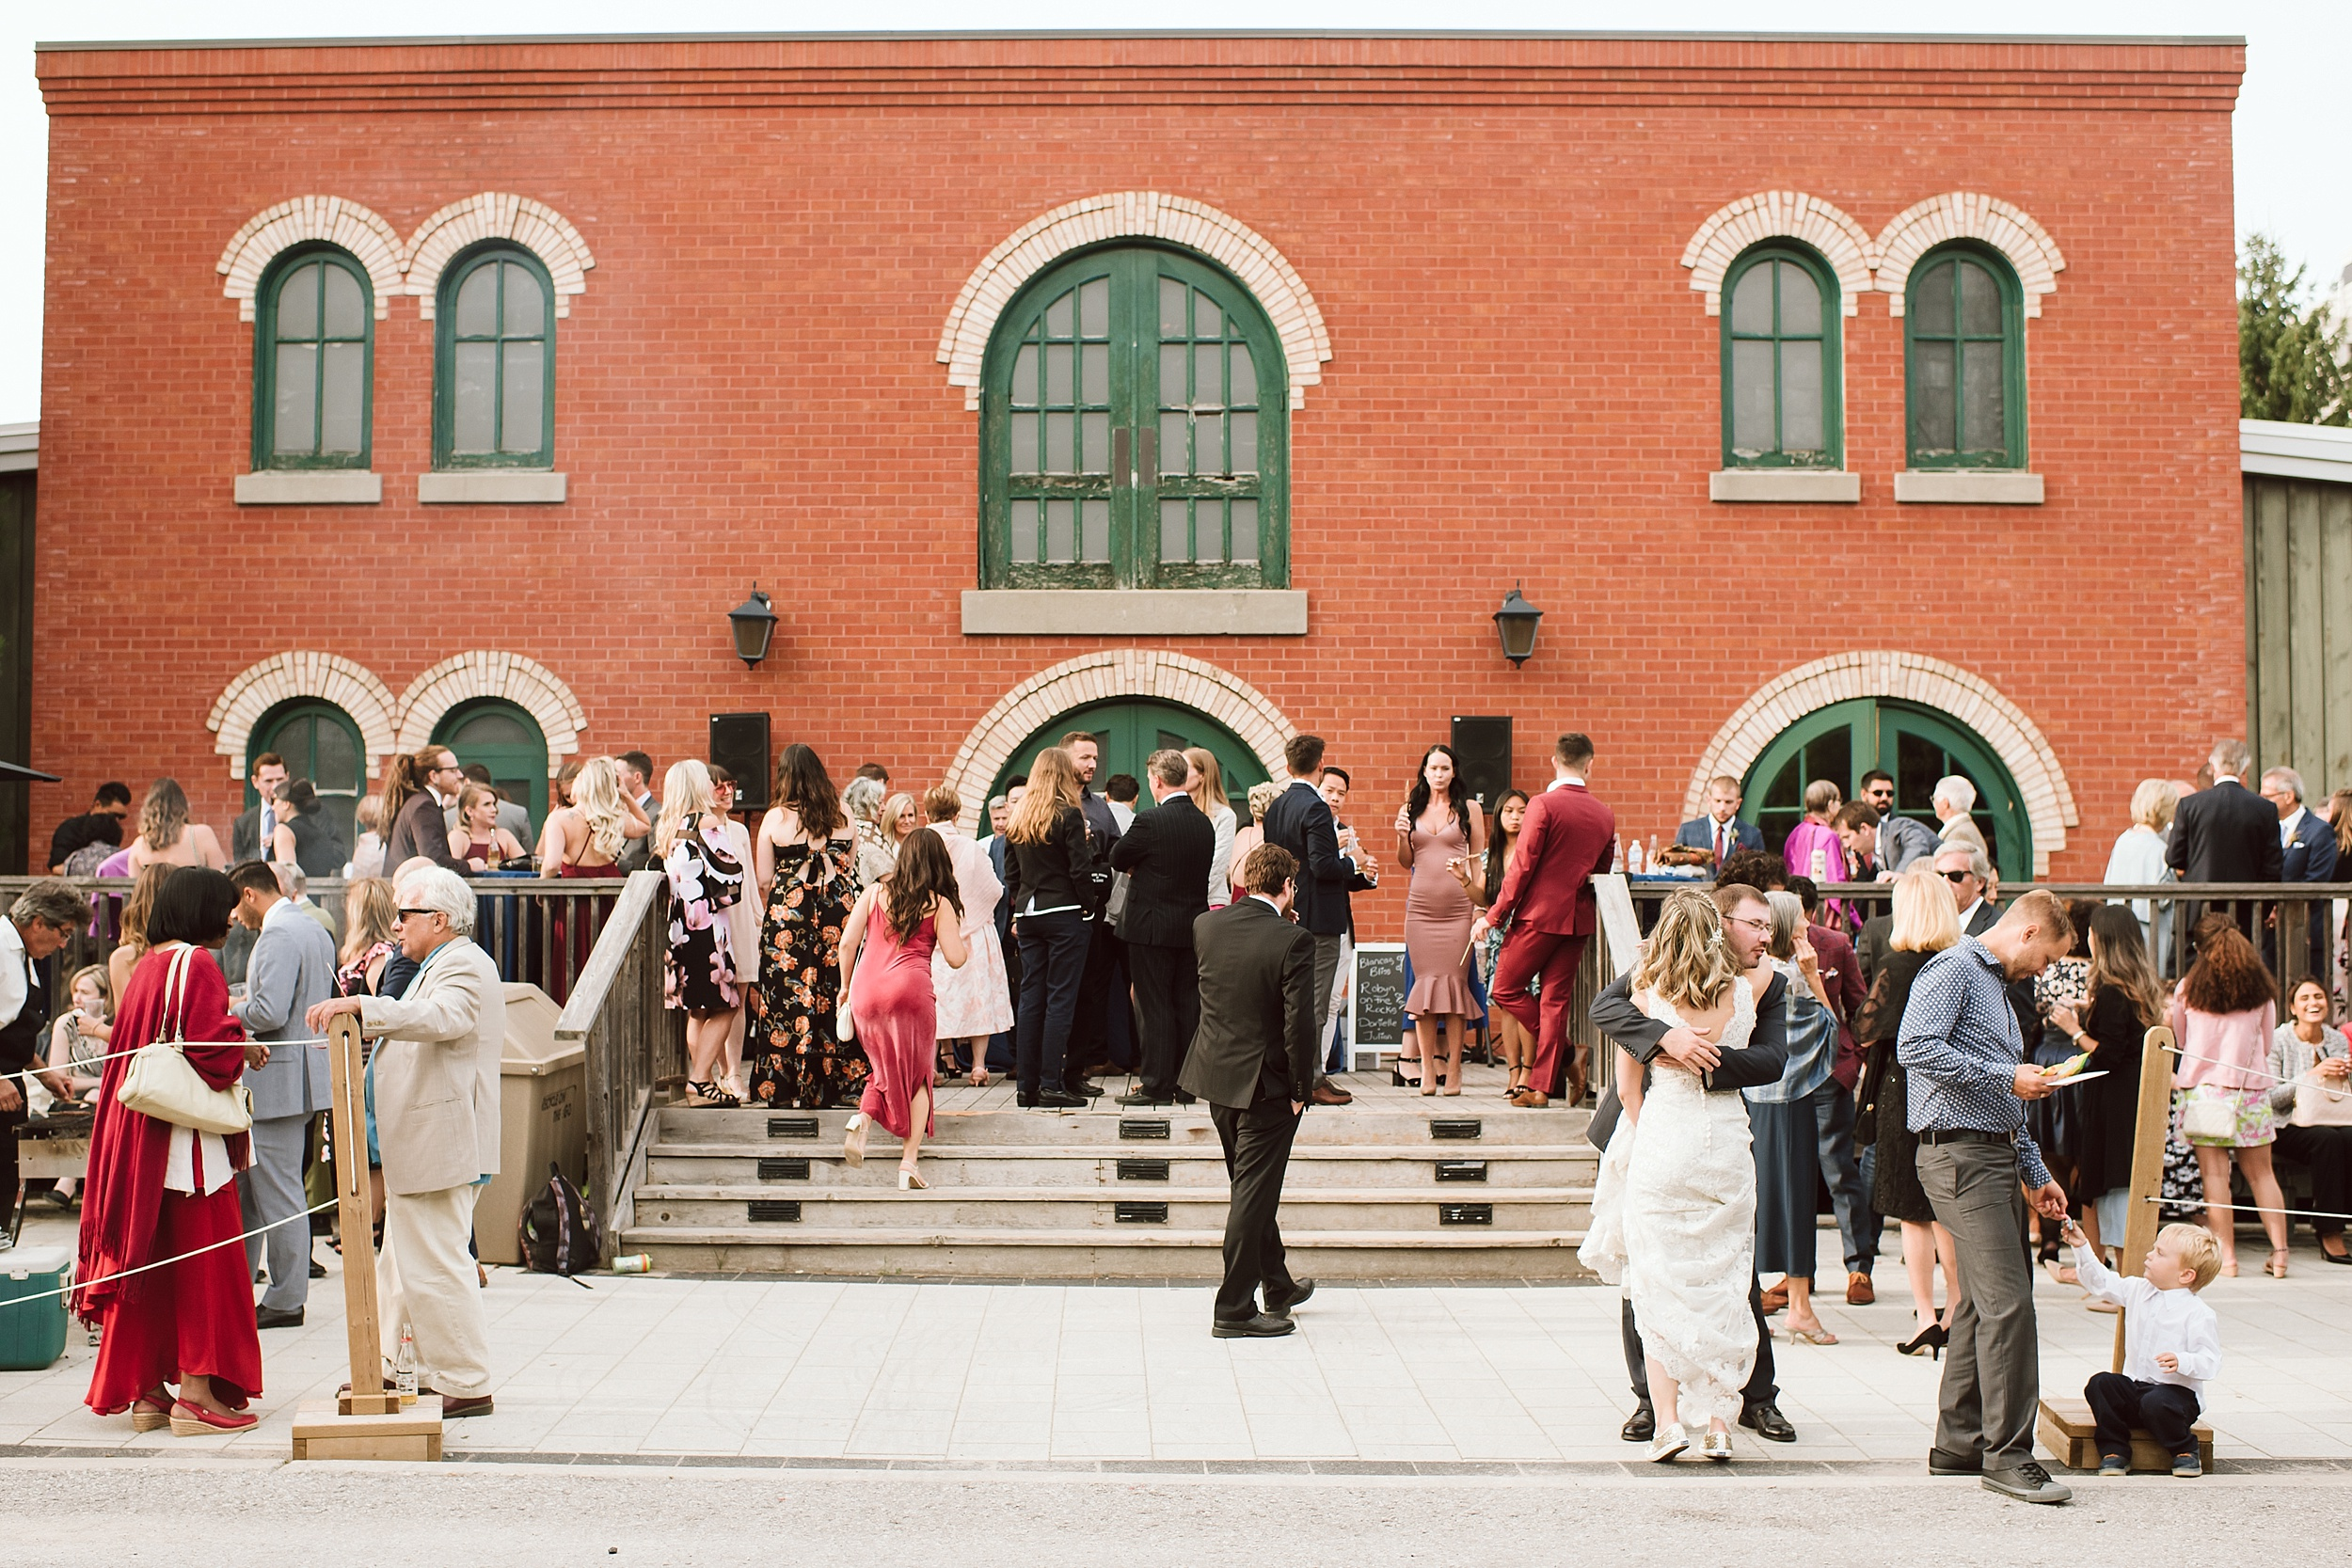 Markham_Museum_Wedding_Toronto_Photographer_0095.jpg